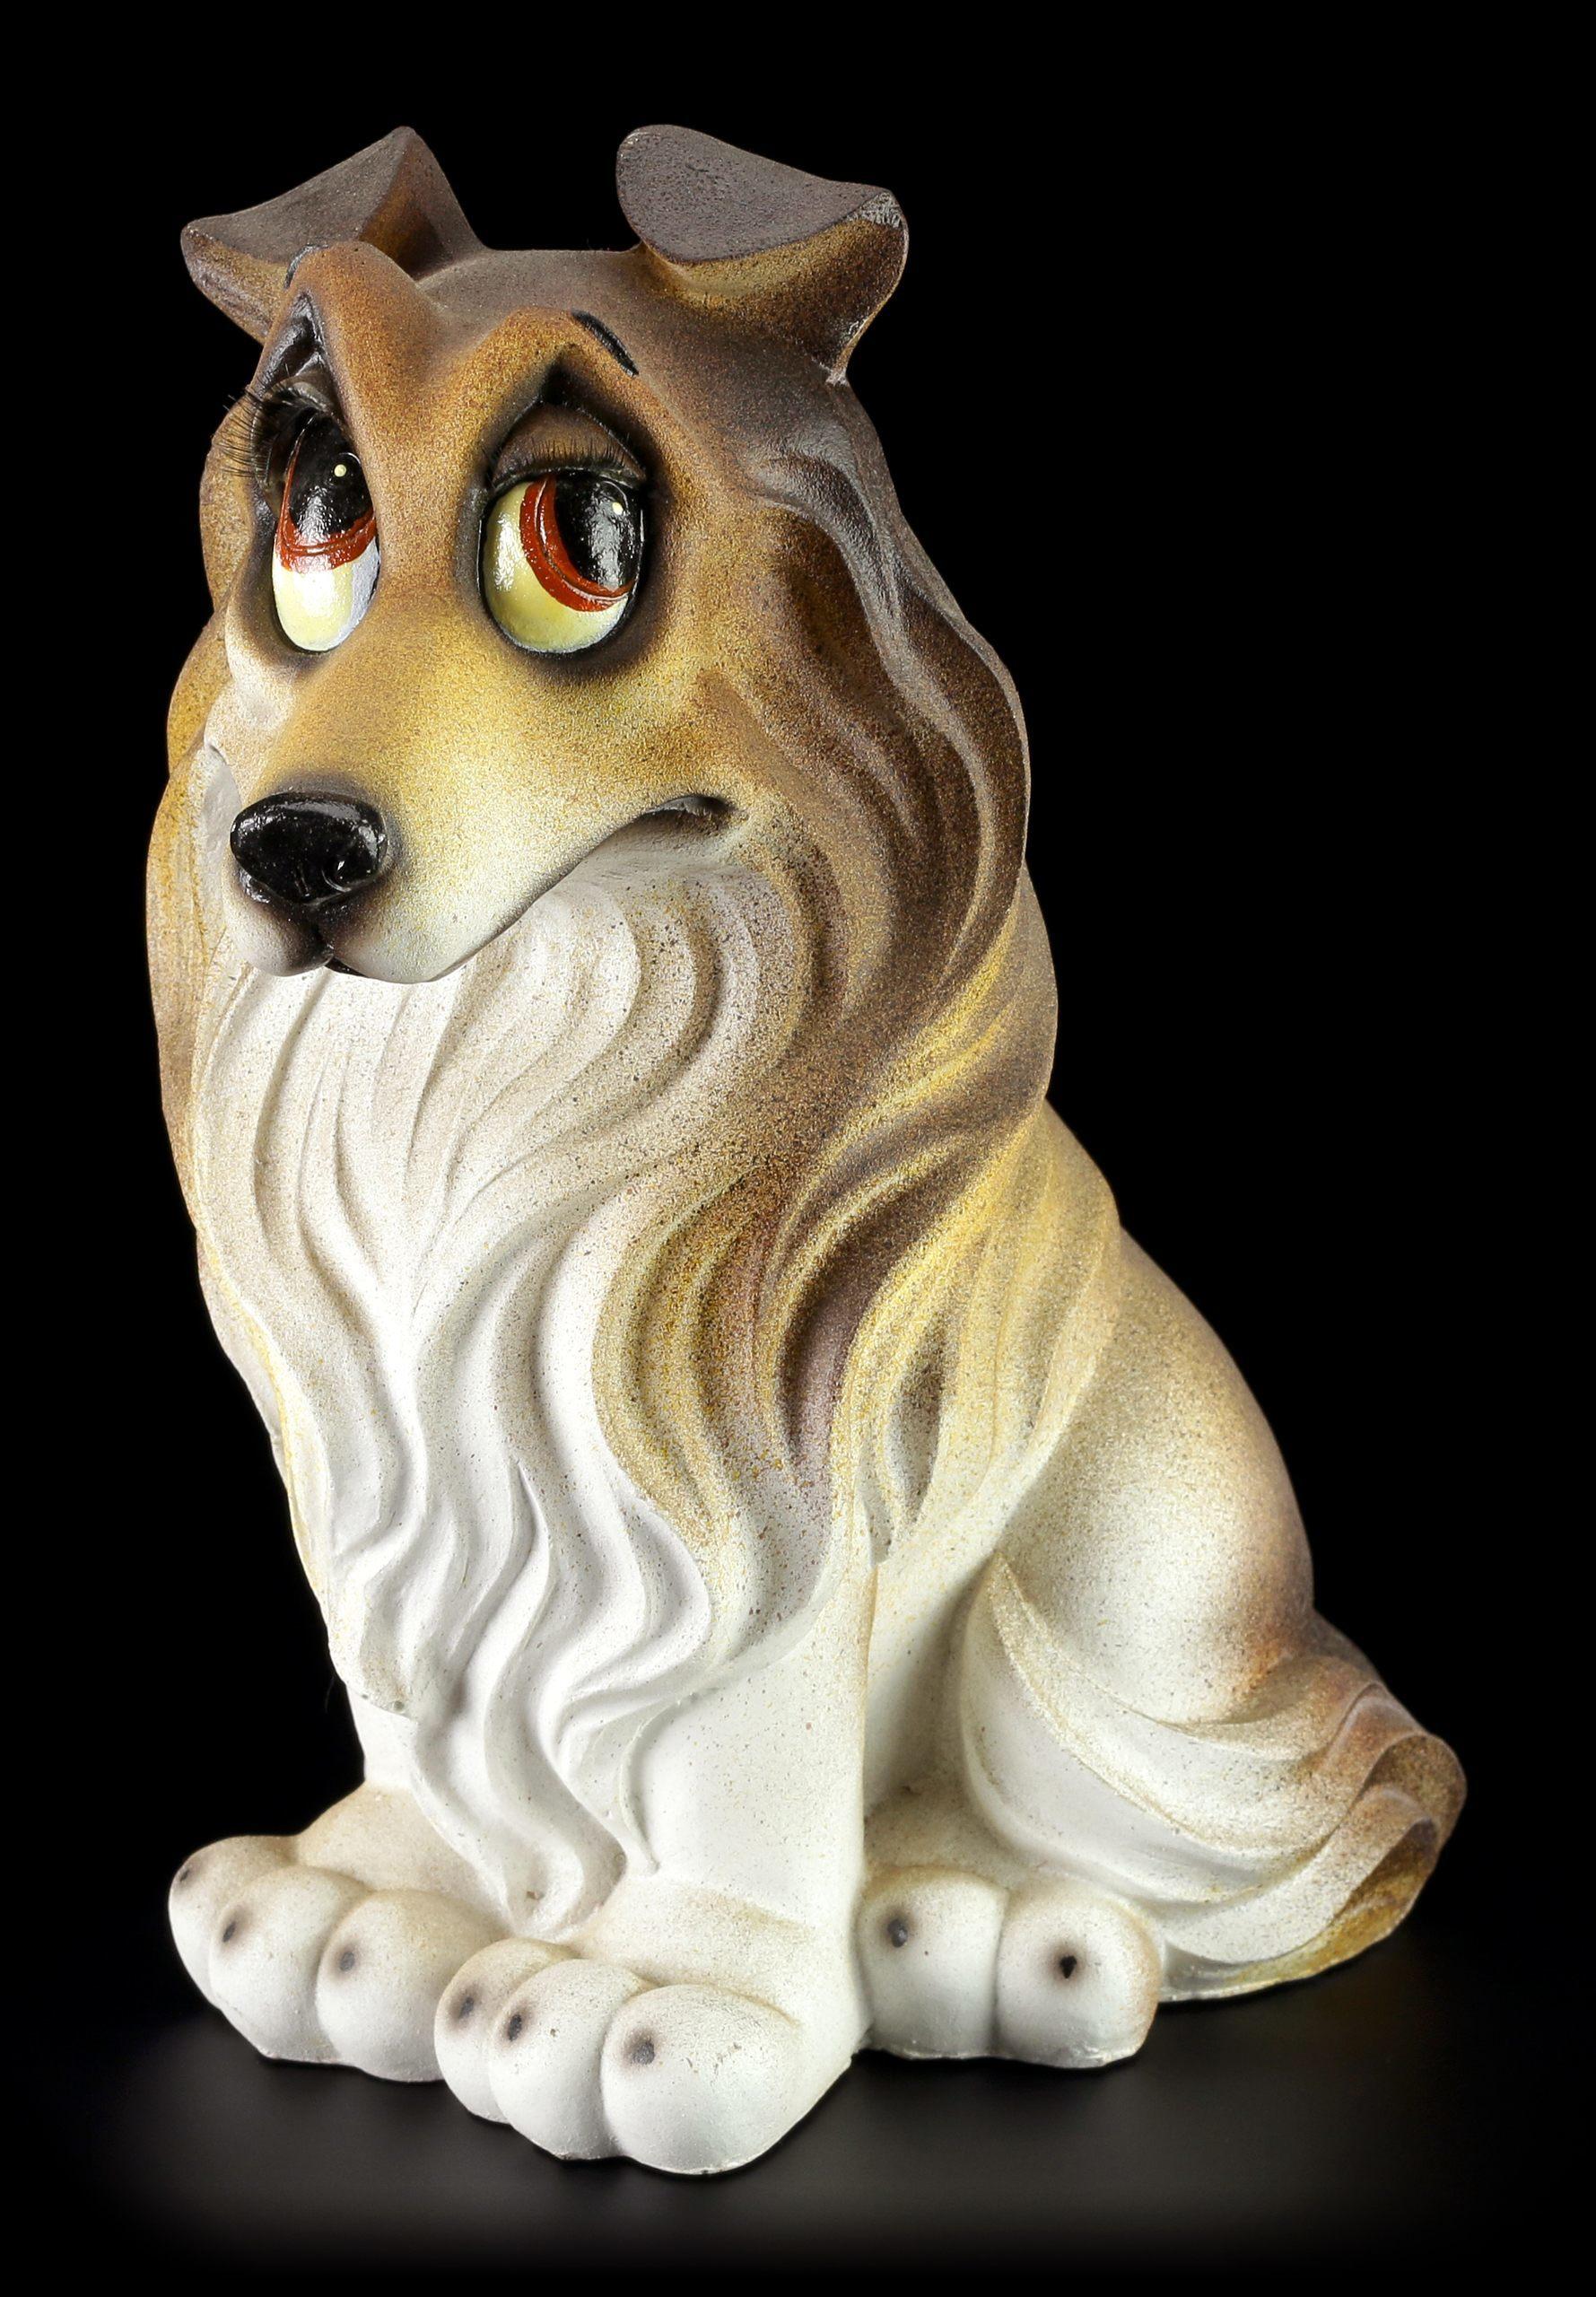 Lustige Hunde Figur - Collie | www.figuren-shop.de